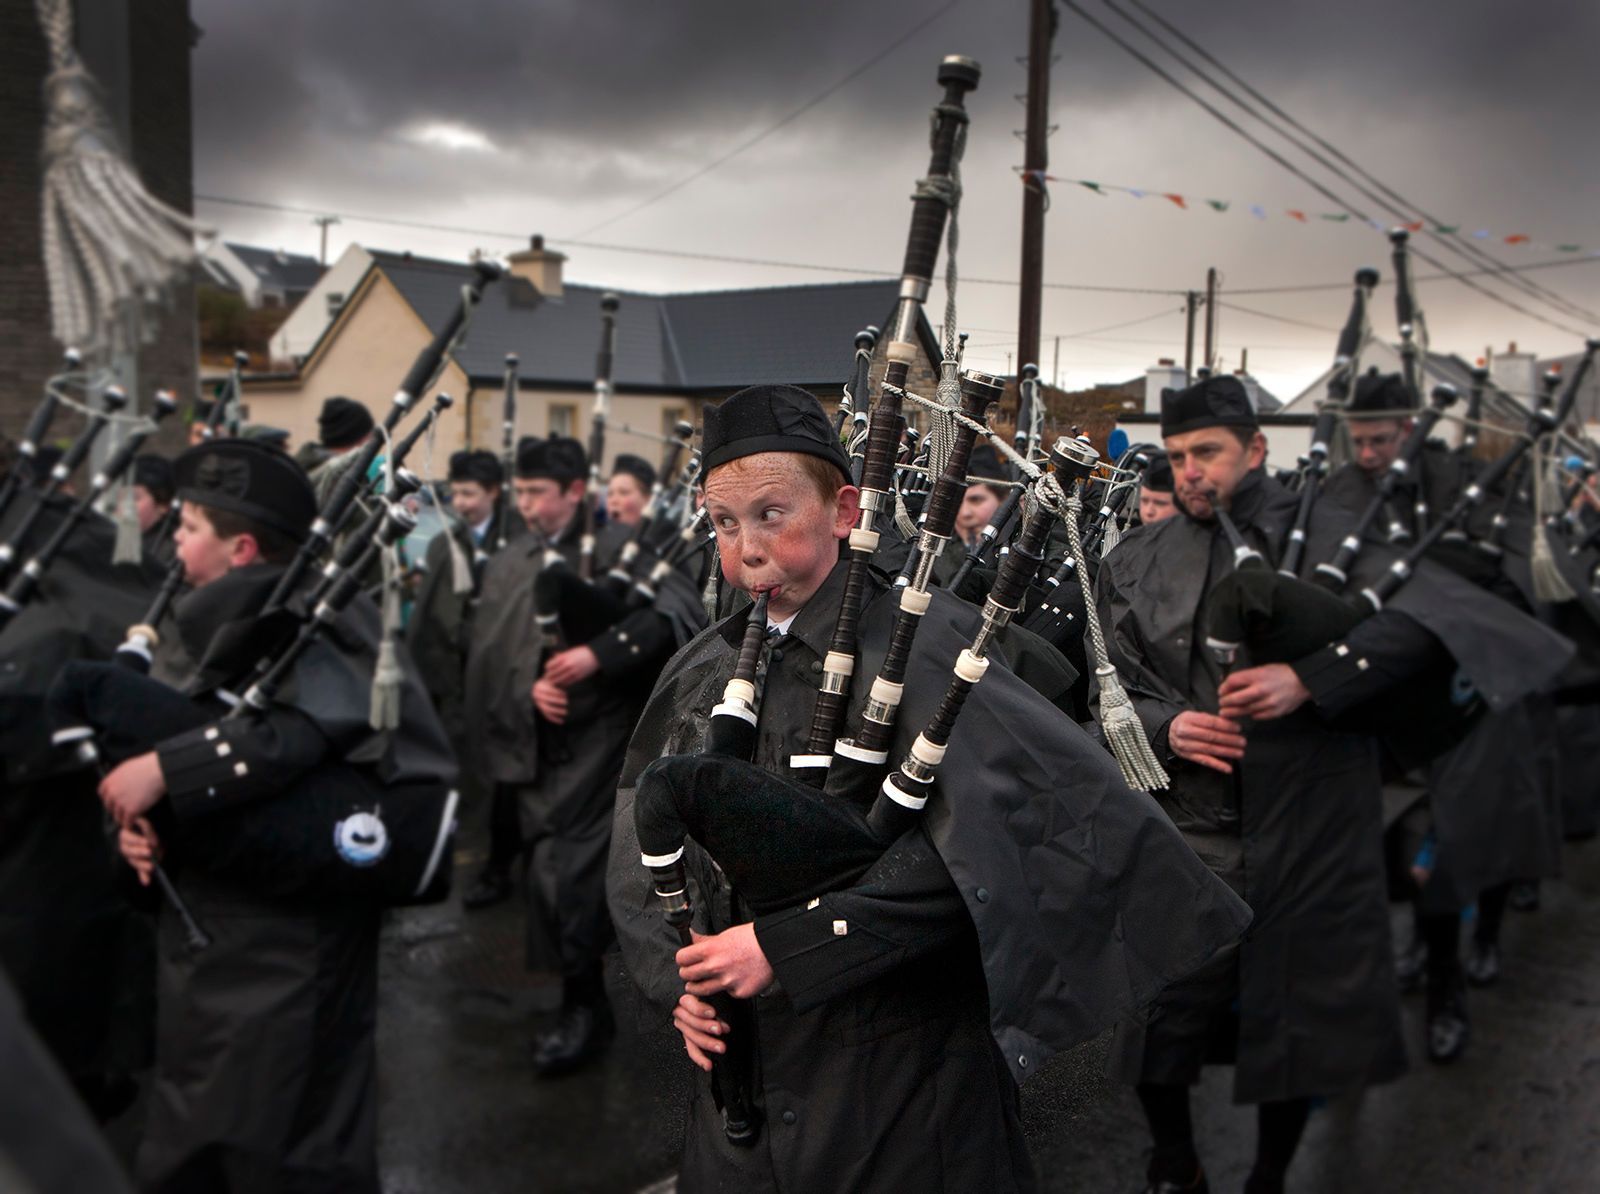 Big Cheeks, Saint Patricks Day Parade, Achill Island, Ireland